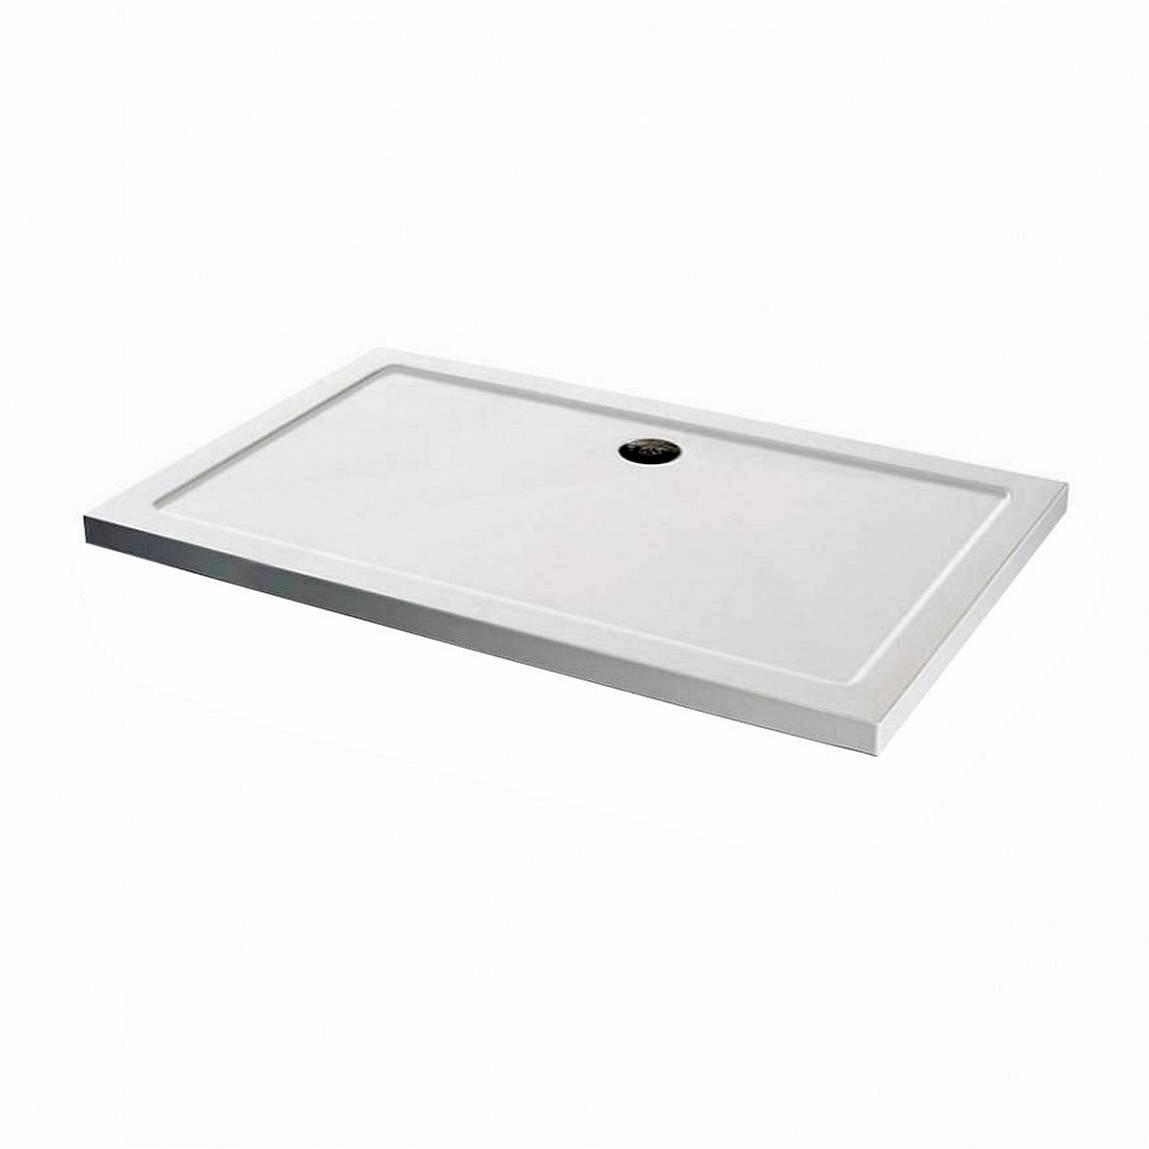 Image of Rectangular Stone Shower Tray 800 x 760